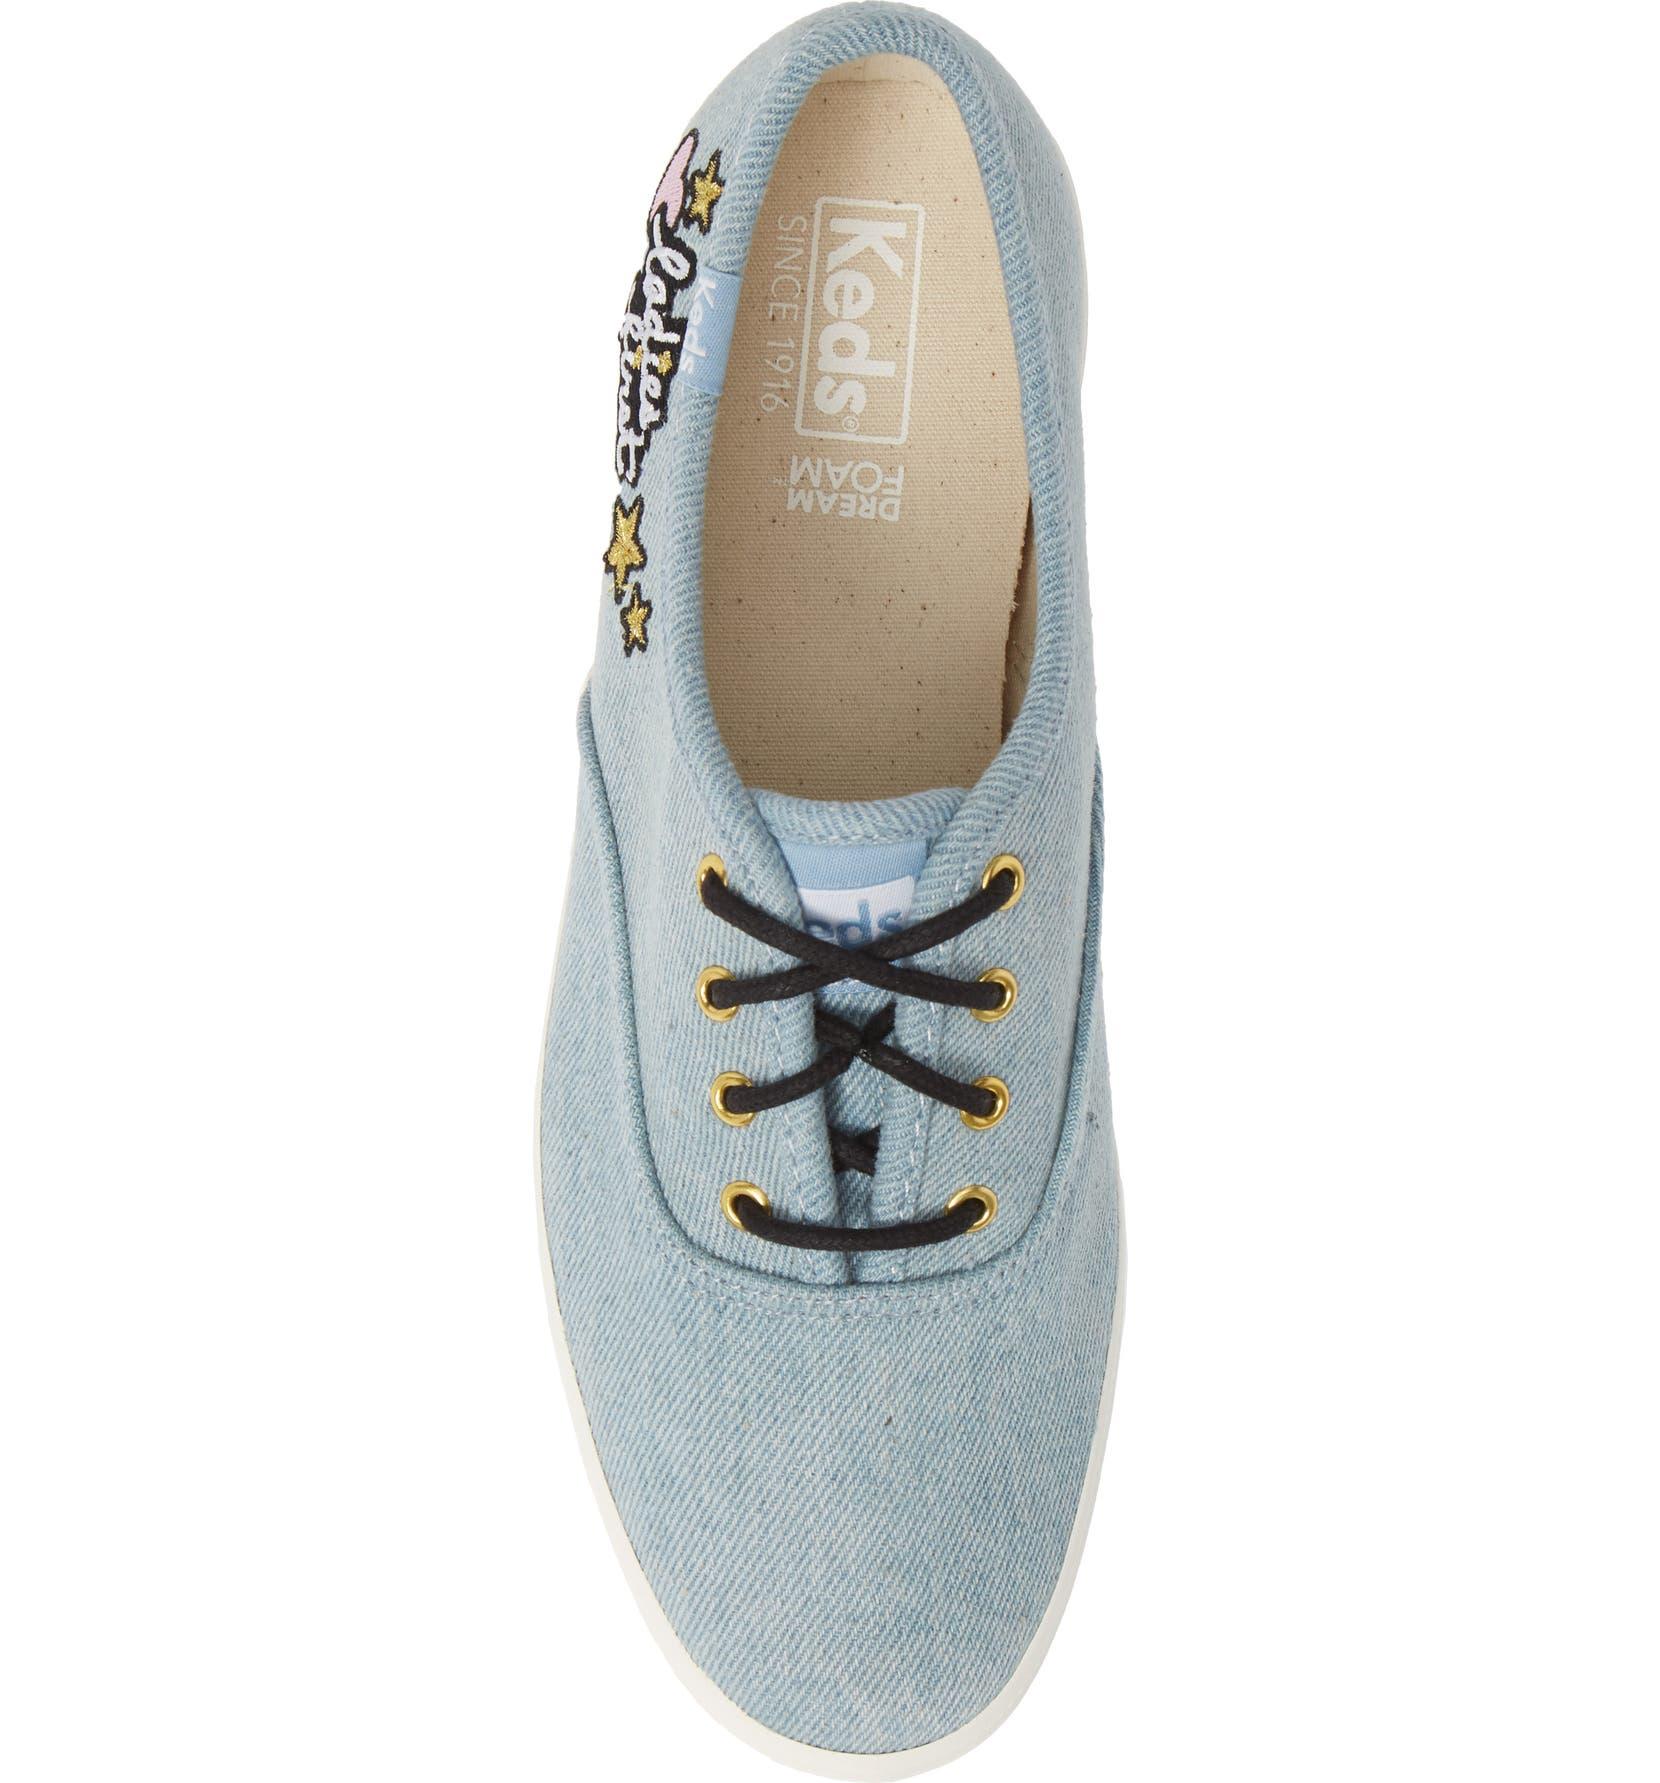 2be1dbf557d90 K E D S X ♤ • • • Keds by Kate Spade New York glitter sneakers have  been